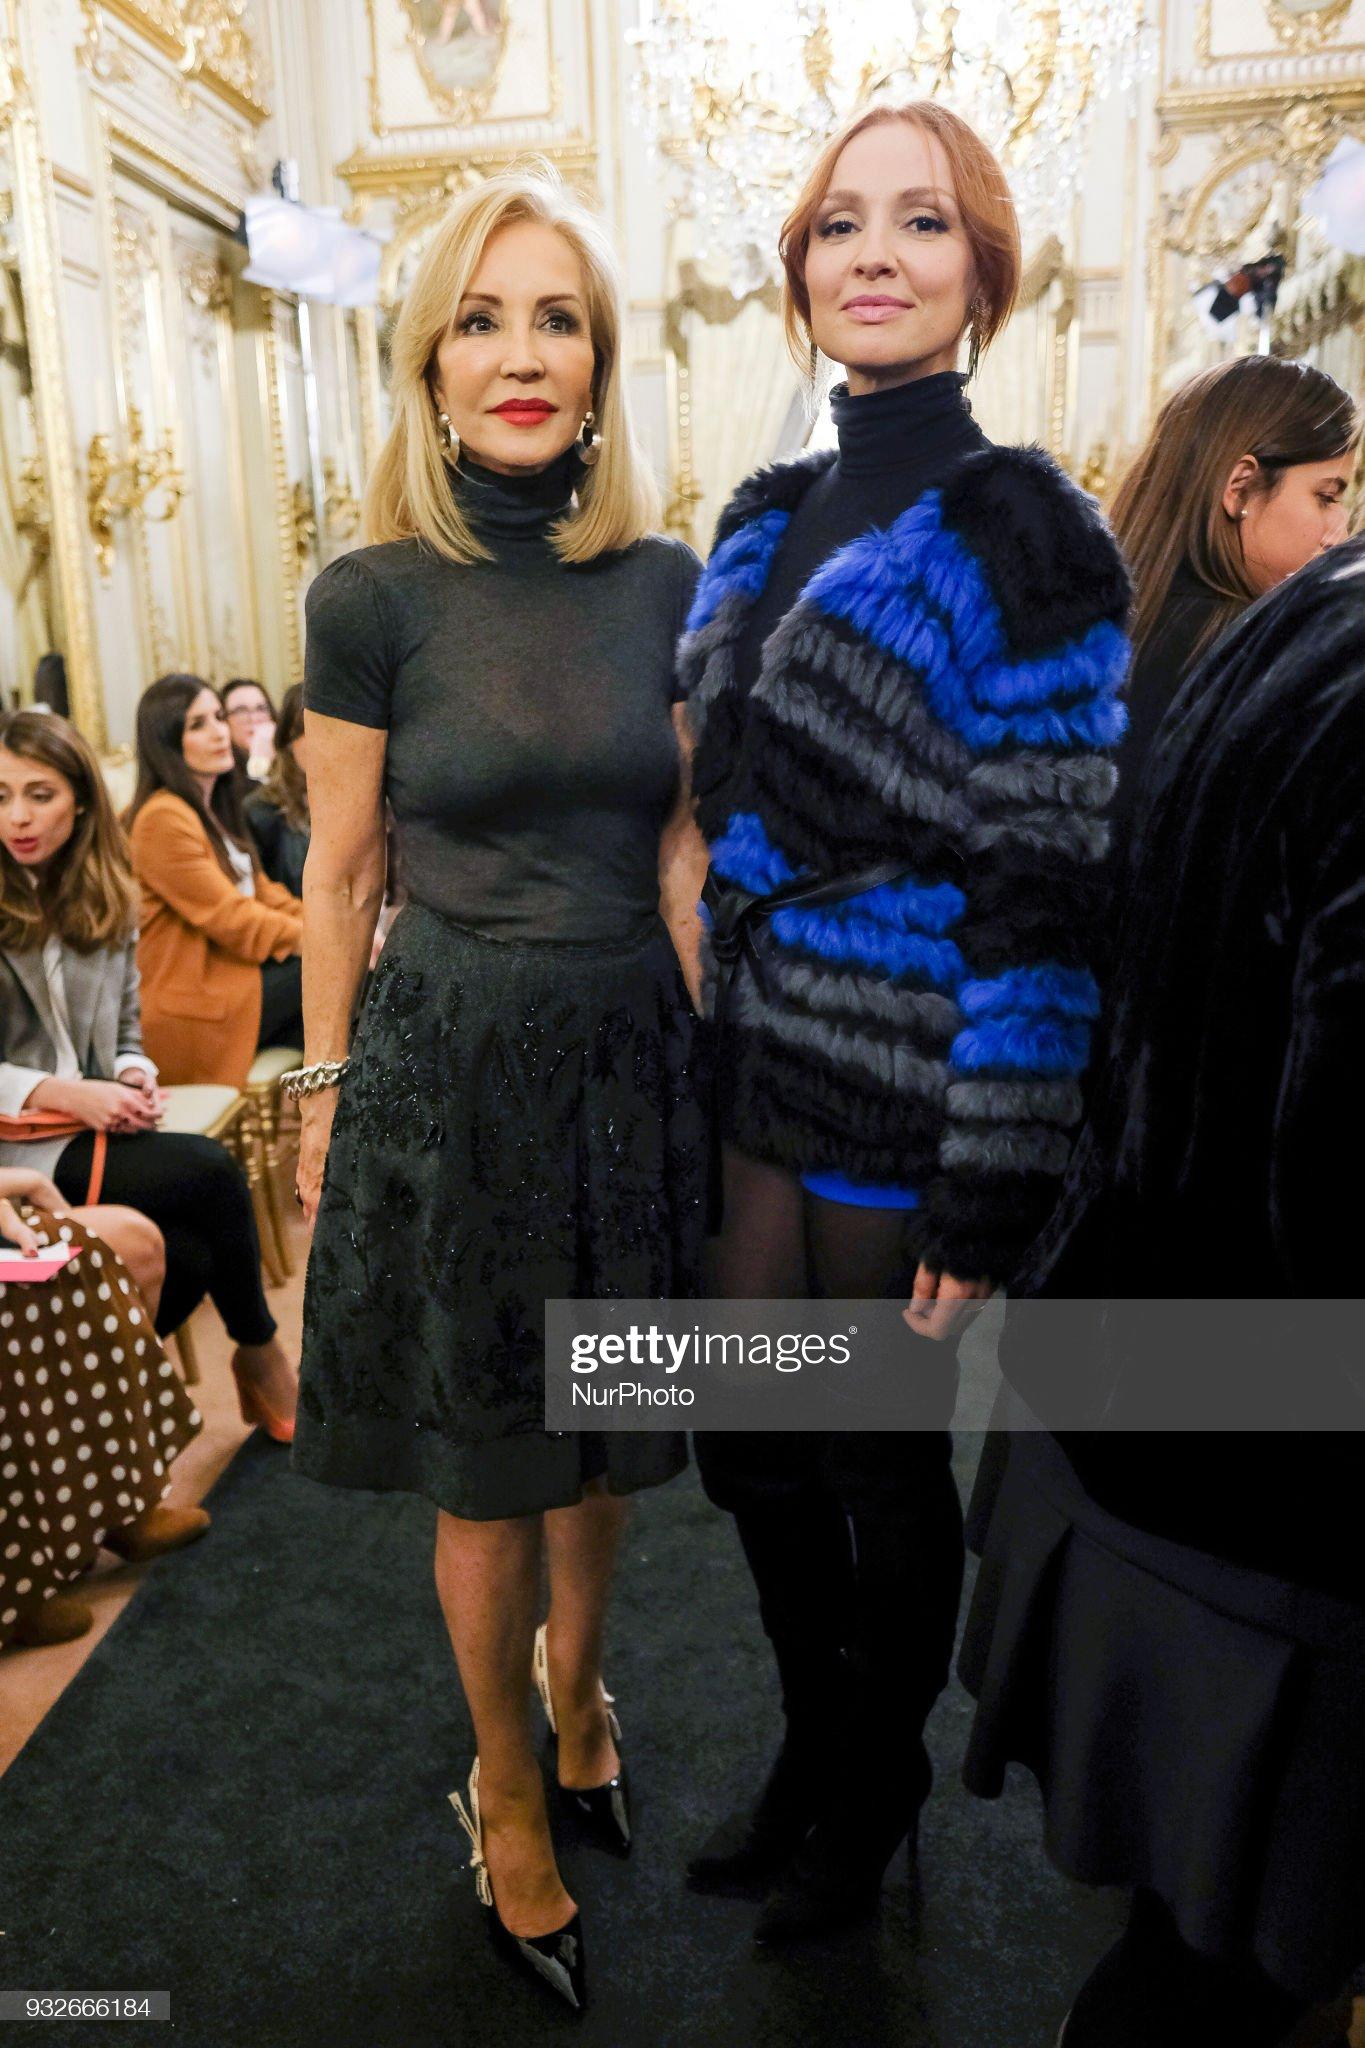 ¿Cuánto mide Carmen Lomana? - Altura Cristina-castao-carmen-lomana-during-fashion-week-atelier-couture-picture-id932666184?s=2048x2048